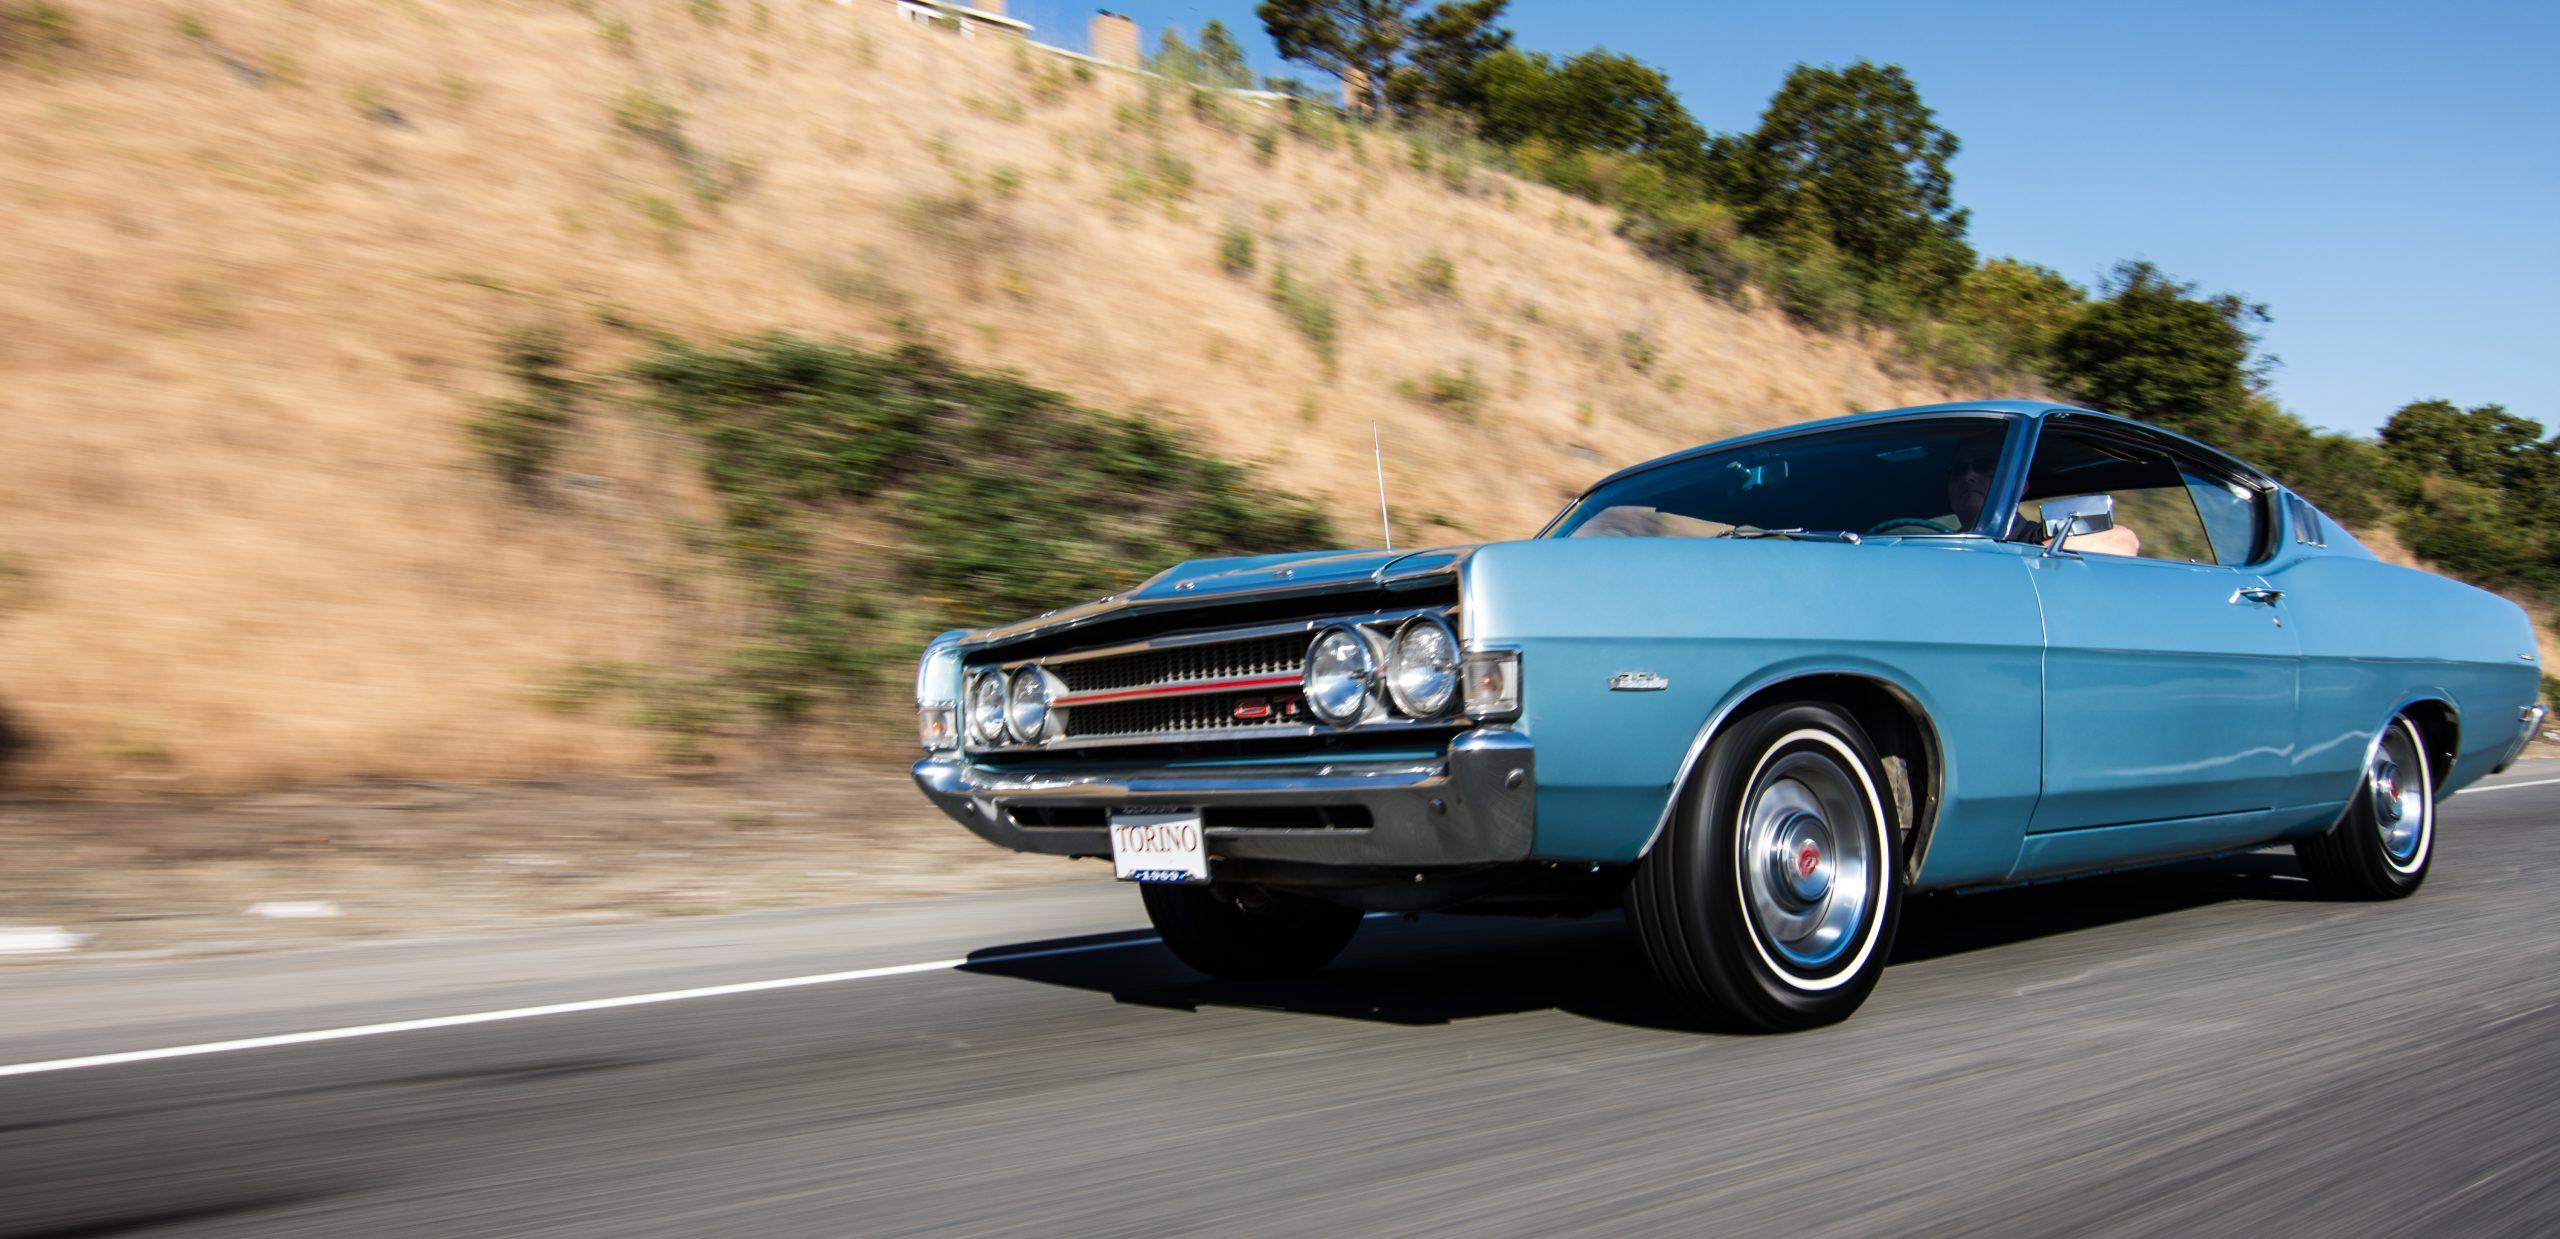 1969 Ford Torino action shot